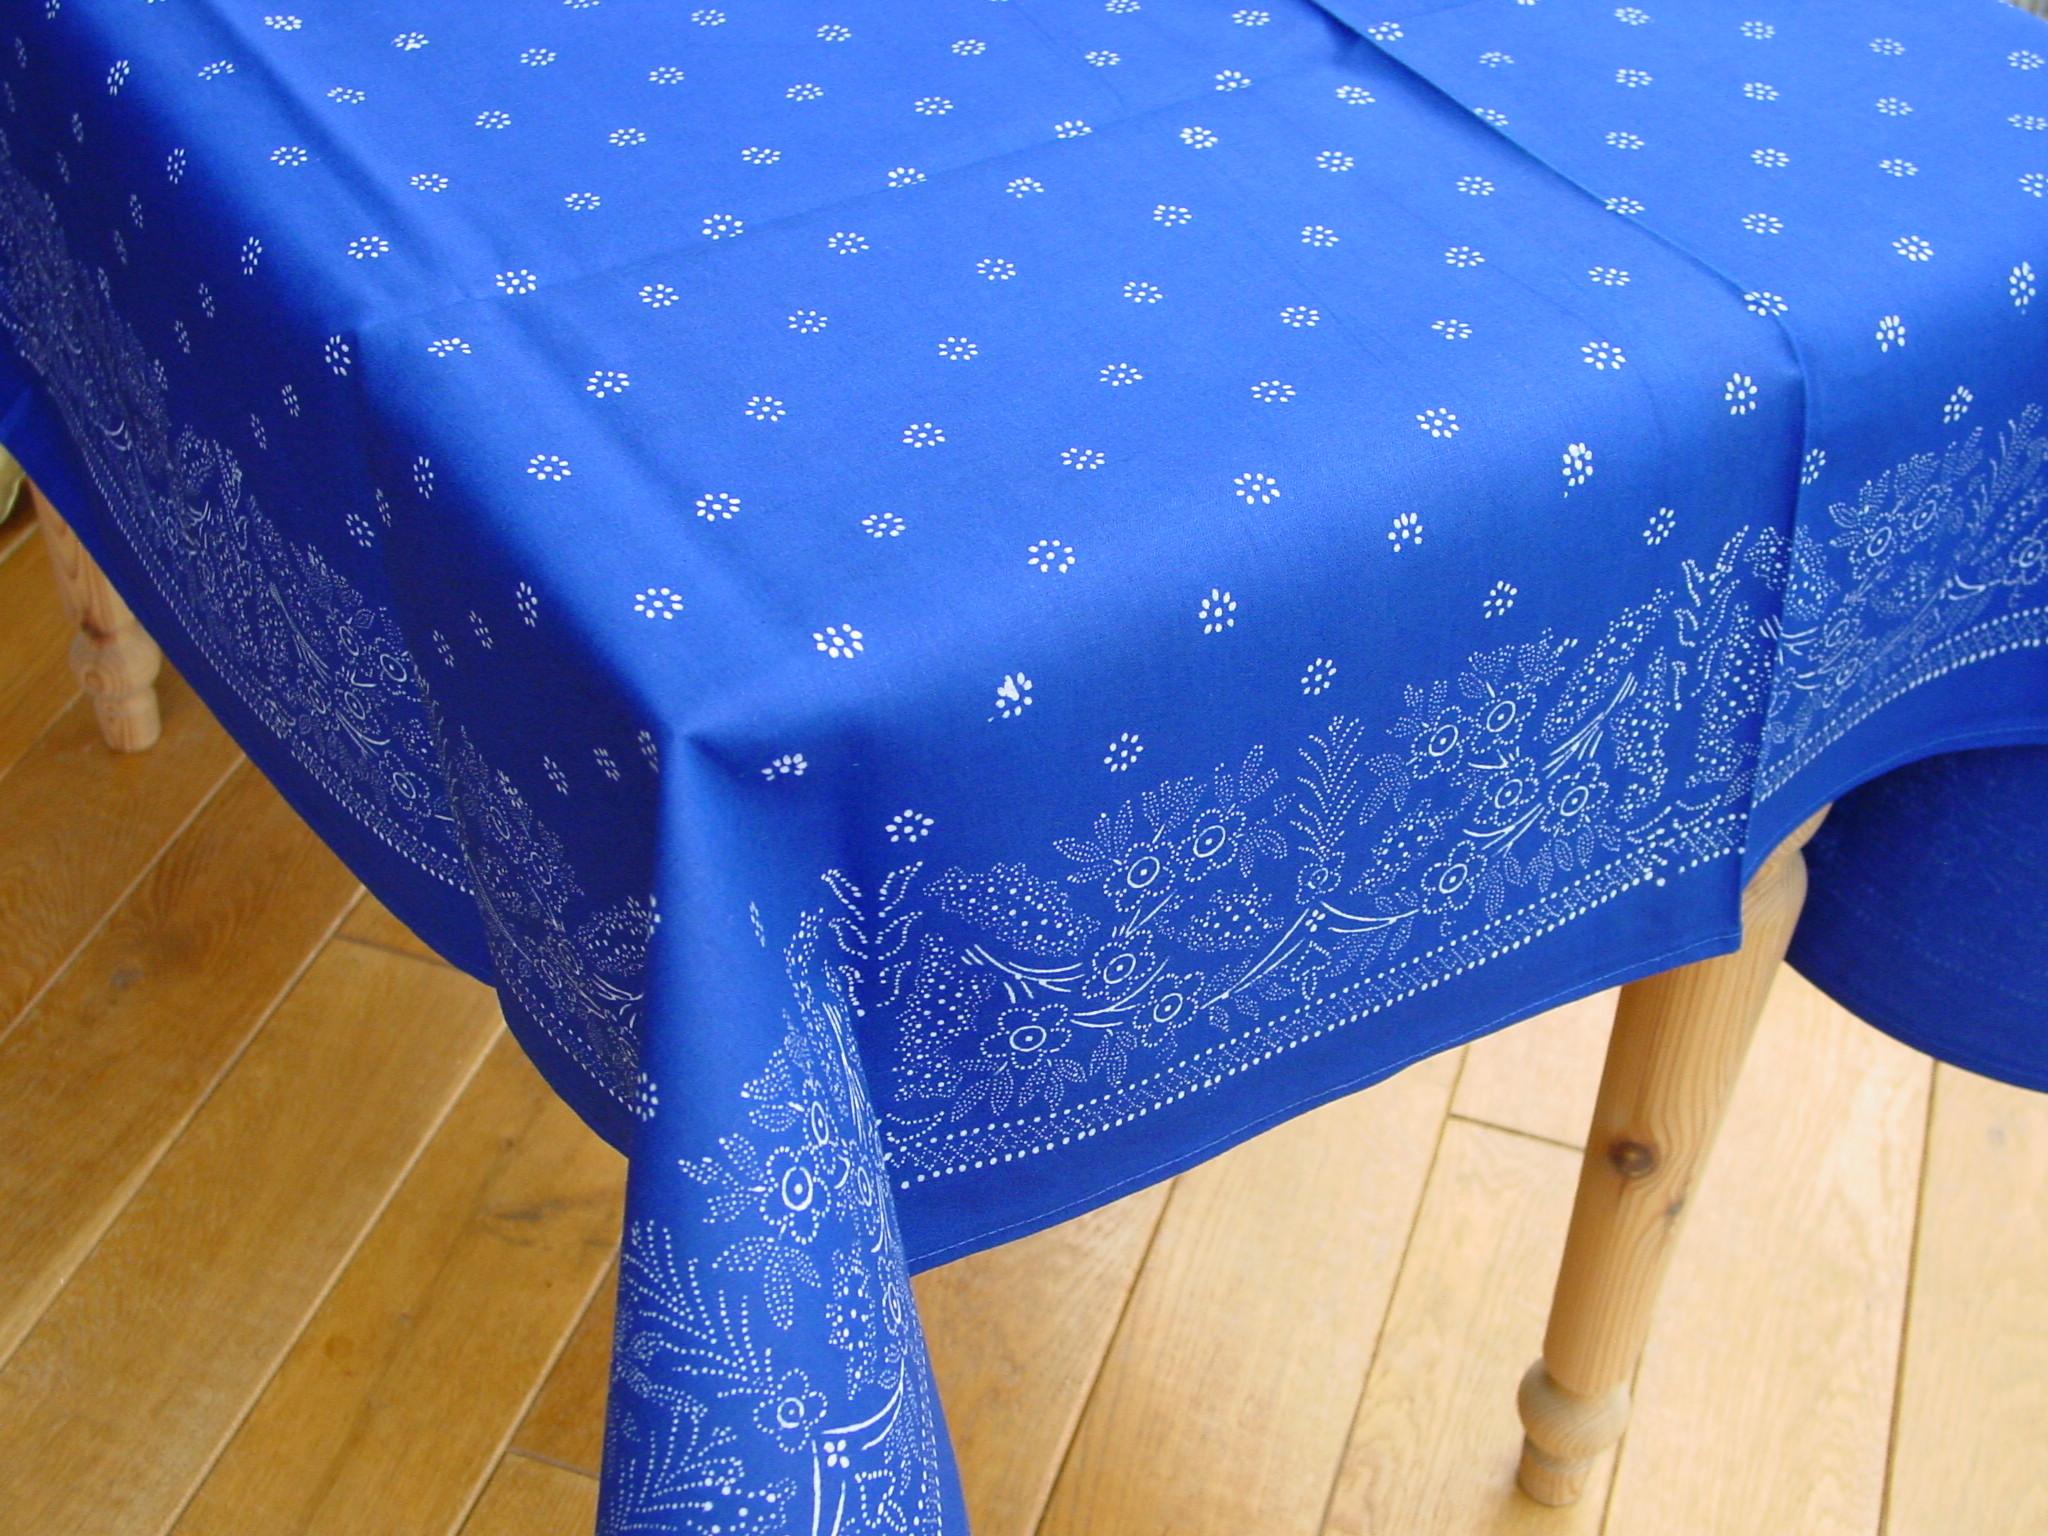 Große Blaudruck-Tischdecke 6479-0